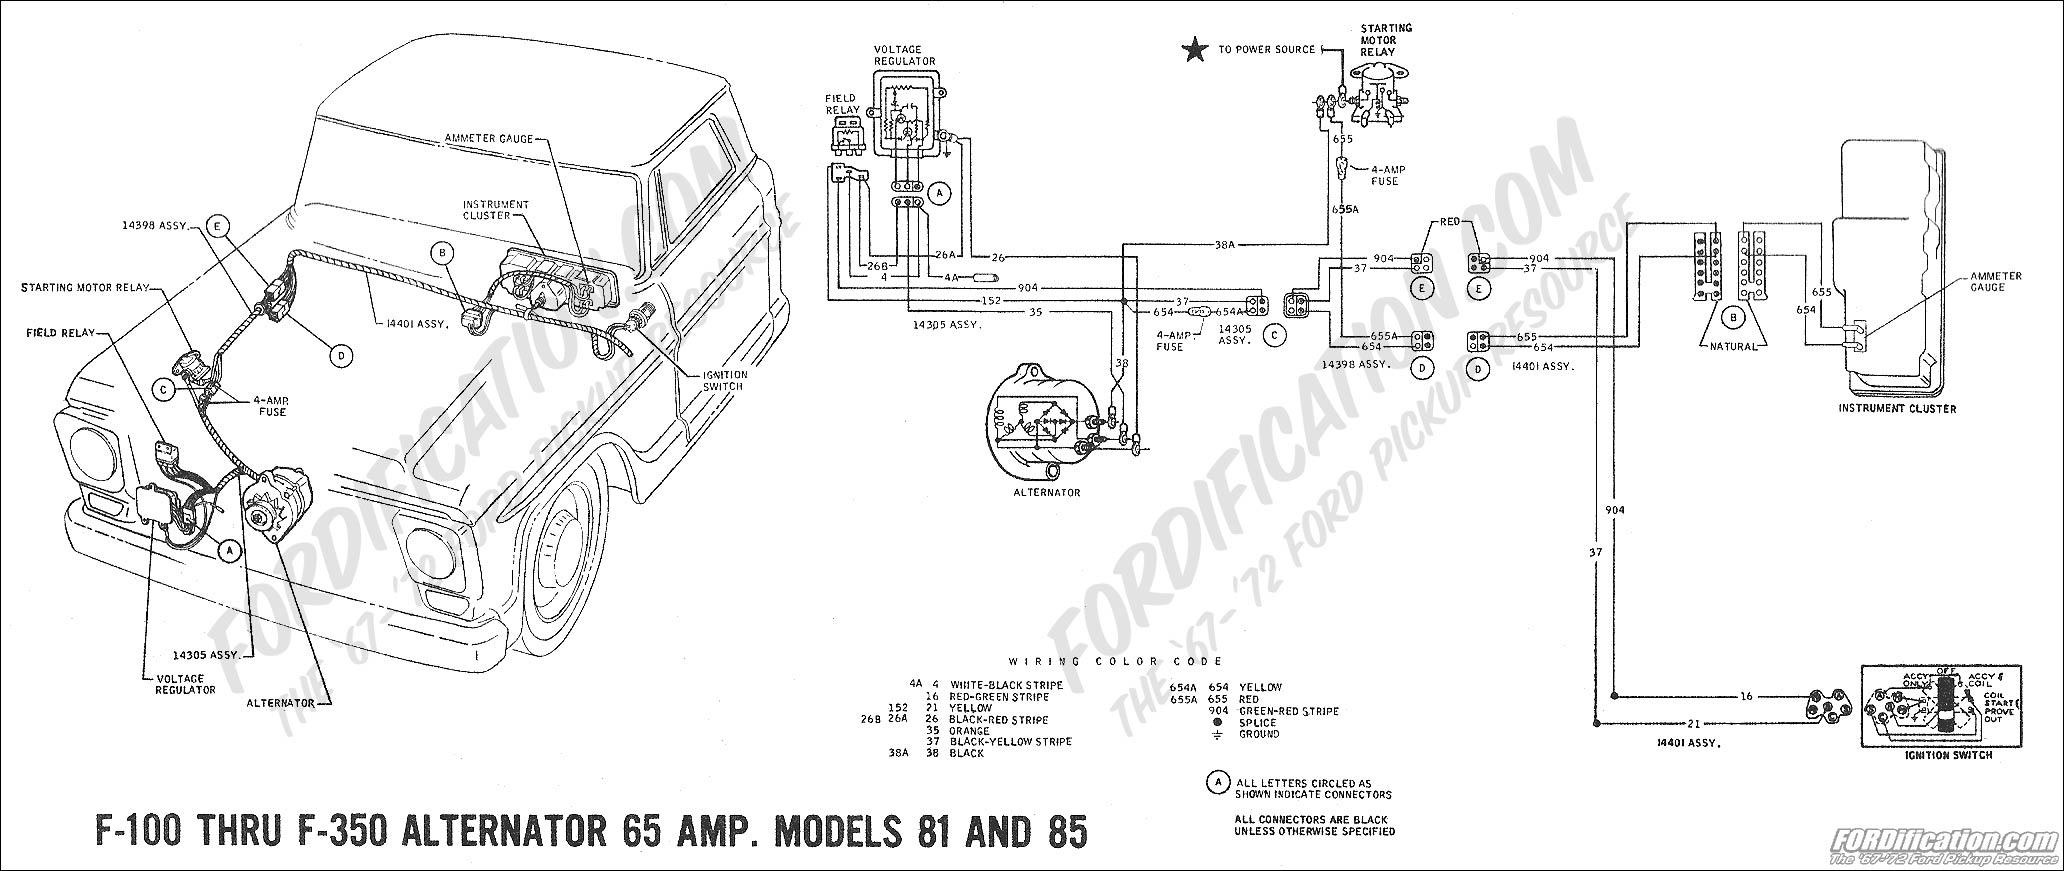 Strange 1970 Ford Truck Alternator Wiring Wiring Diagram Wiring Cloud Ittabisraaidewilluminateatxorg